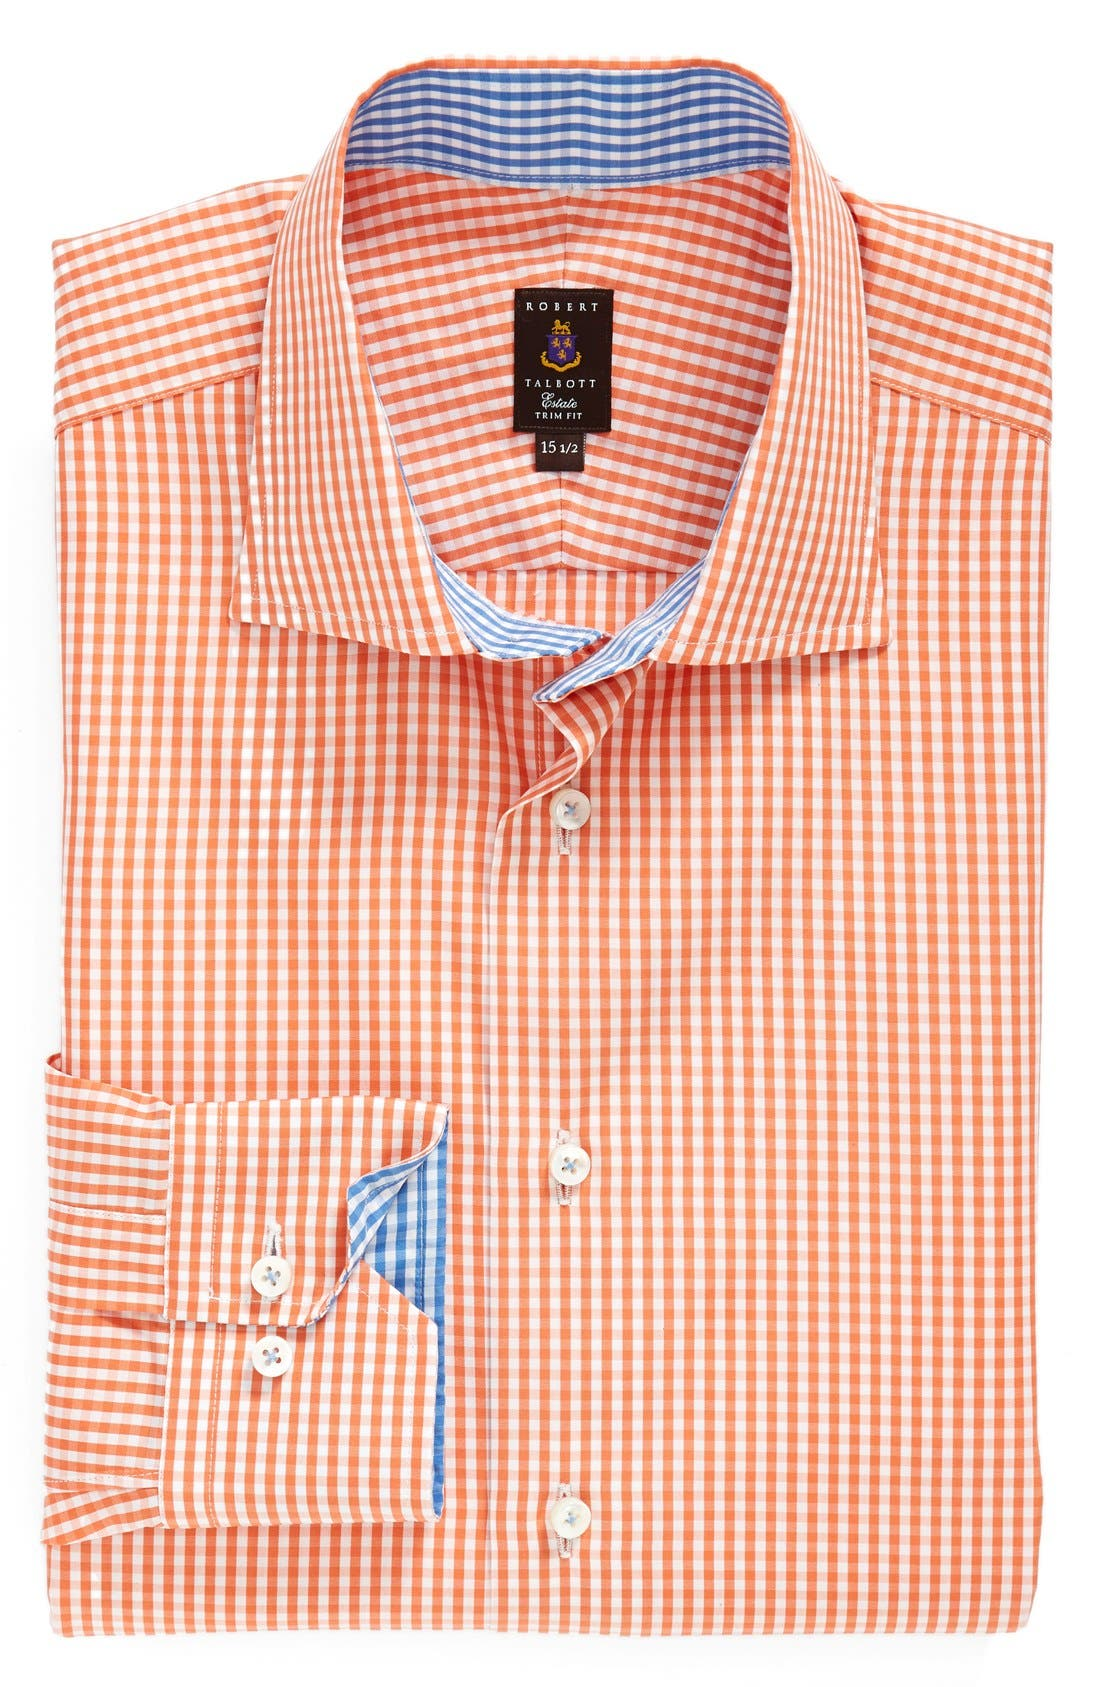 Main Image - Robert Talbott Trim Fit Check Dress Shirt